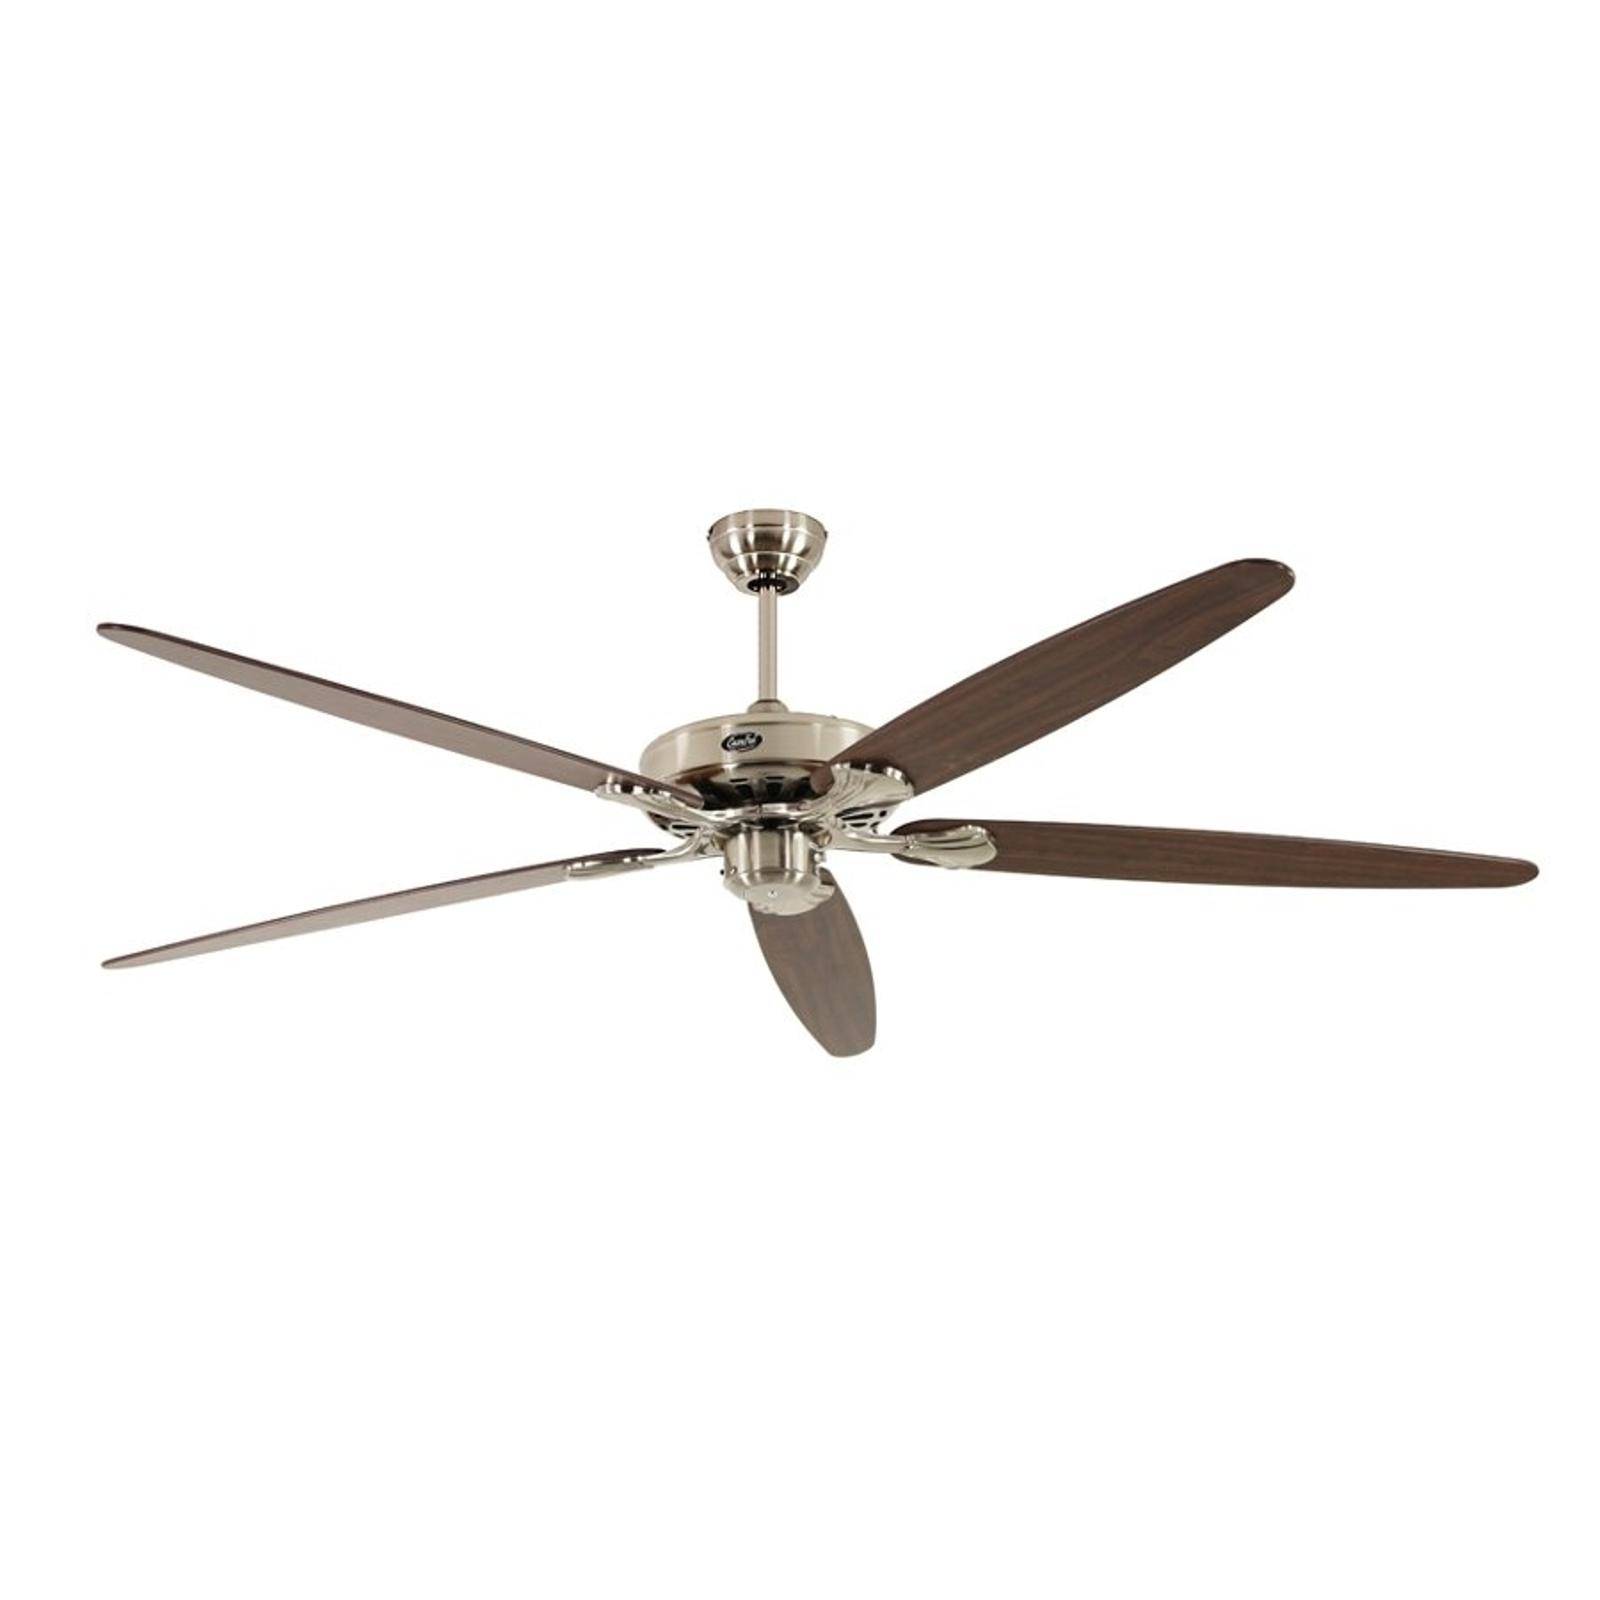 Stropní ventilátor Classic Royal 180, chrom/dub